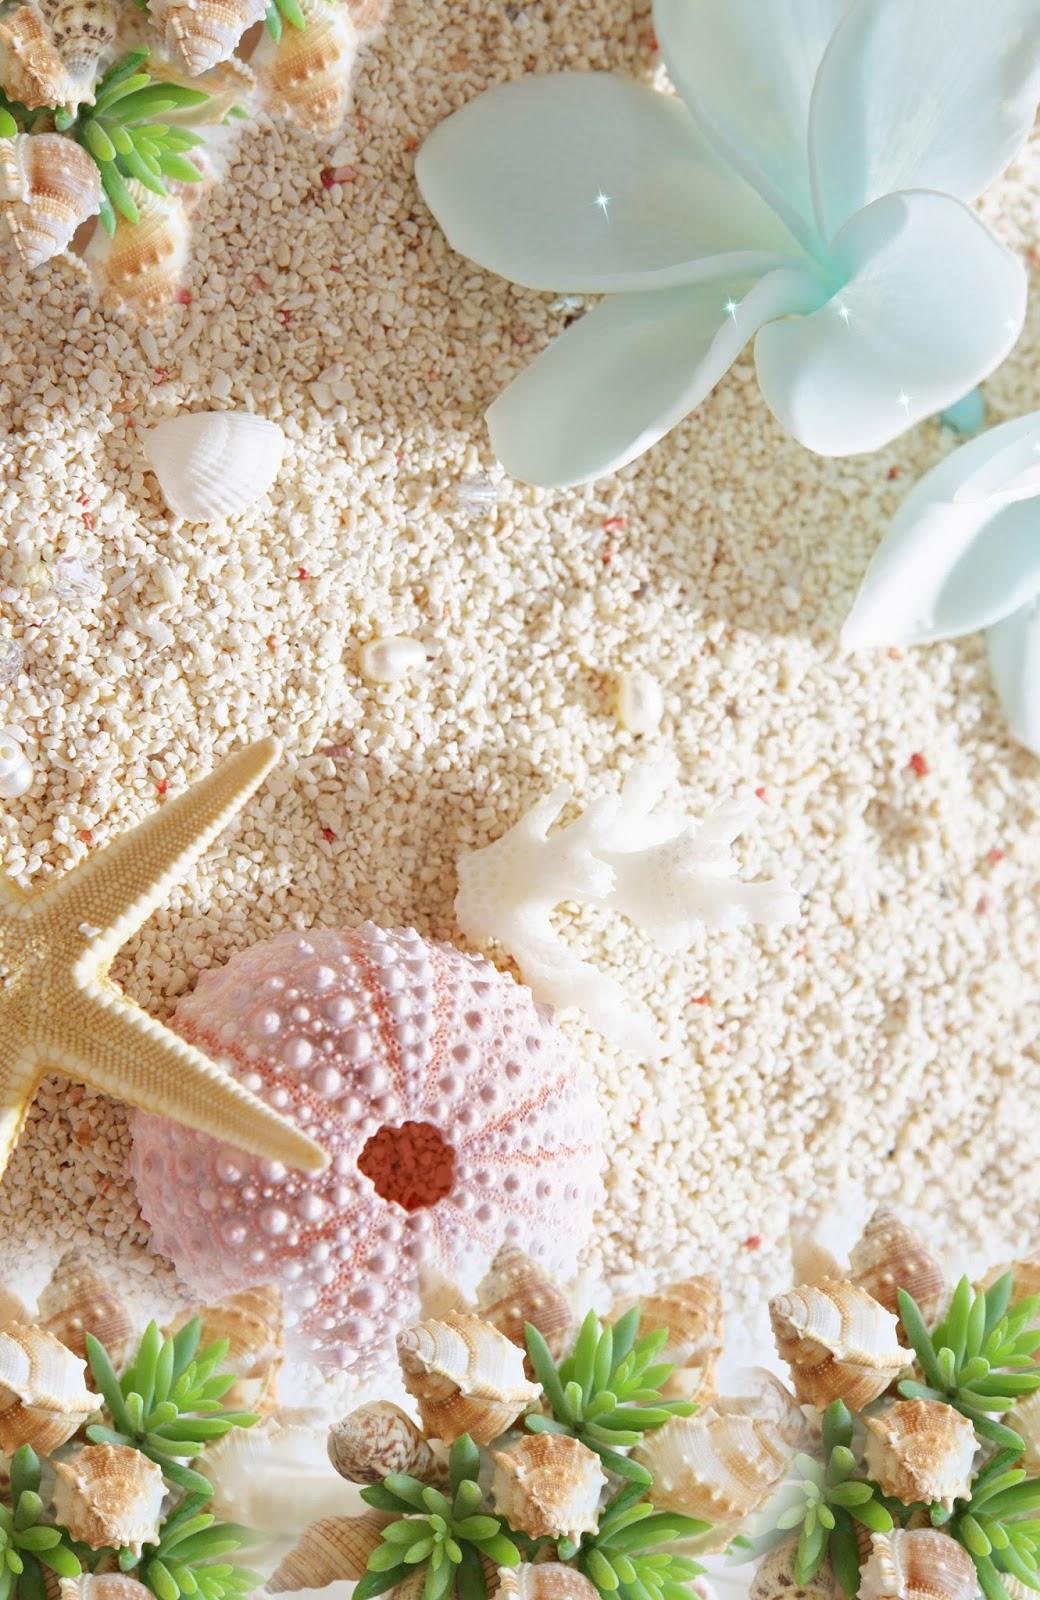 Beach Weddings Invitations Template Free Download